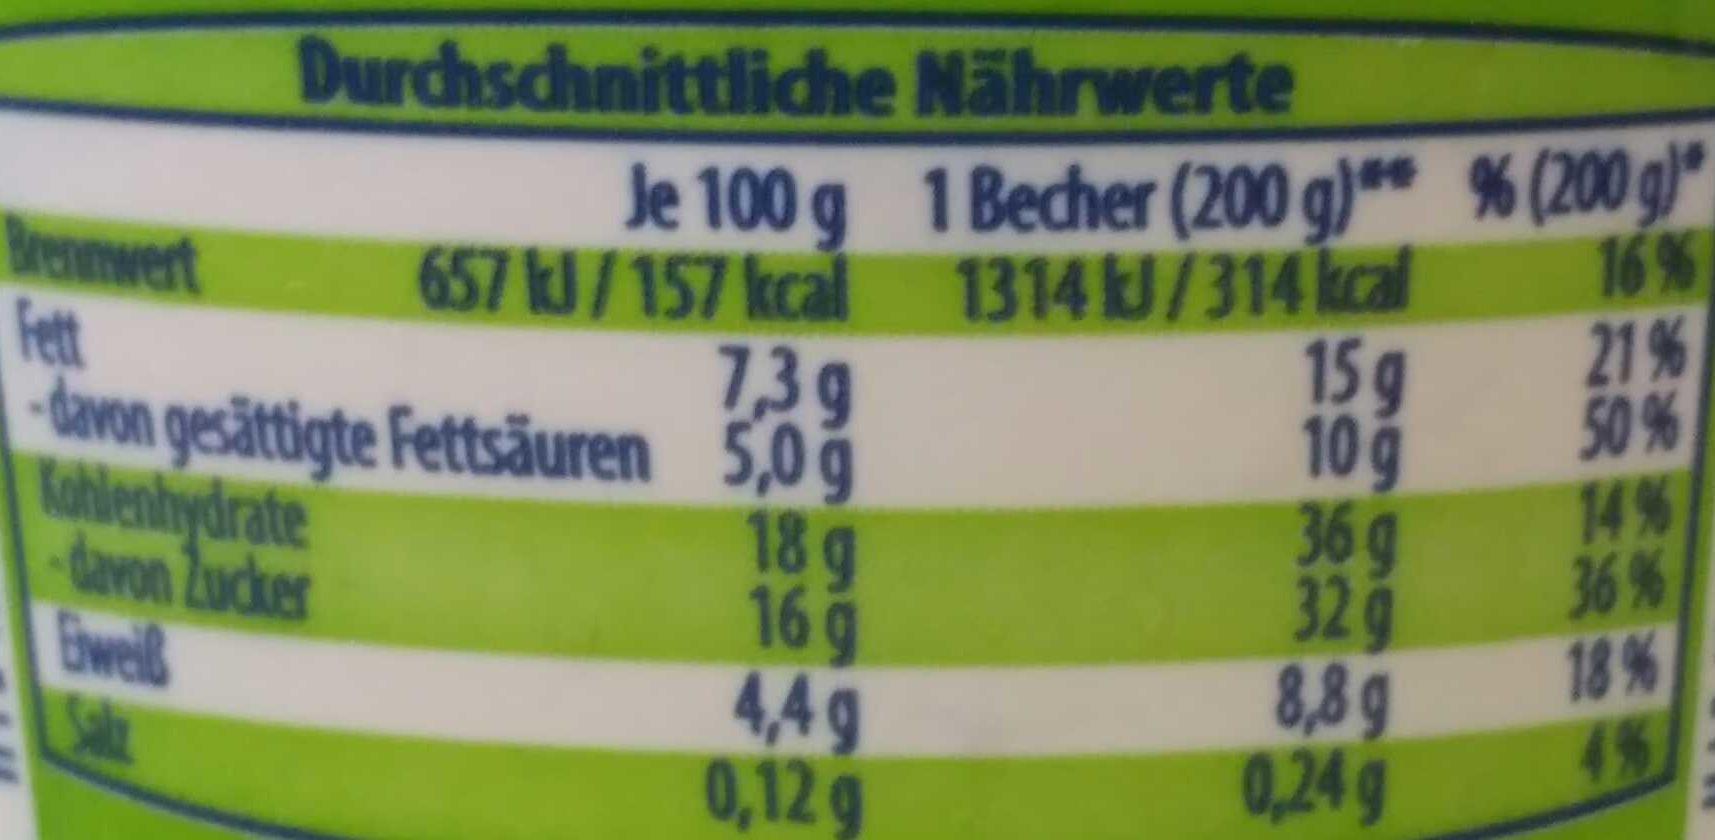 Creme Dessert mit Schokolade Zabalone - Voedingswaarden - de